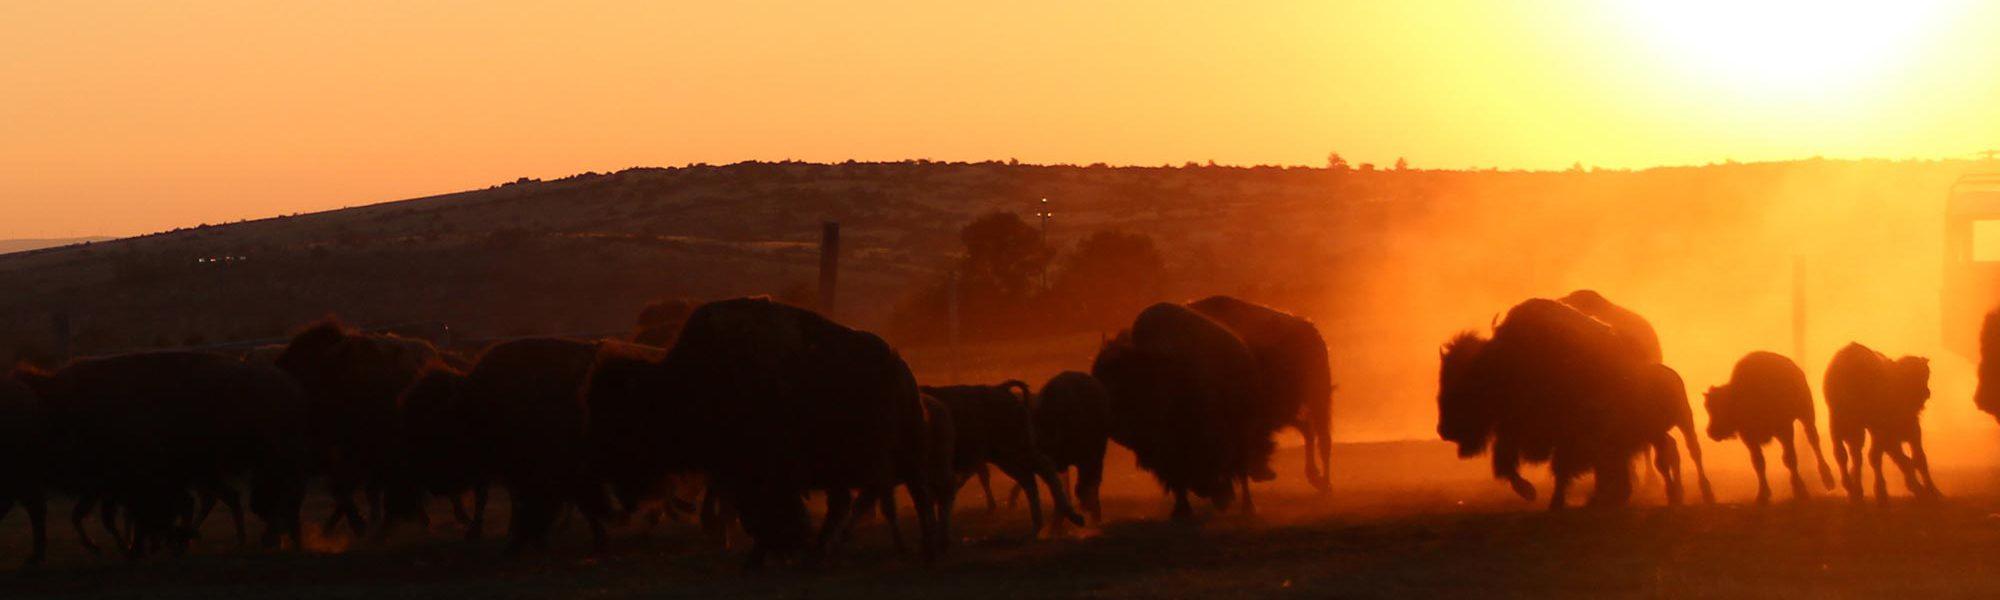 s-bisons-coucher-soleil